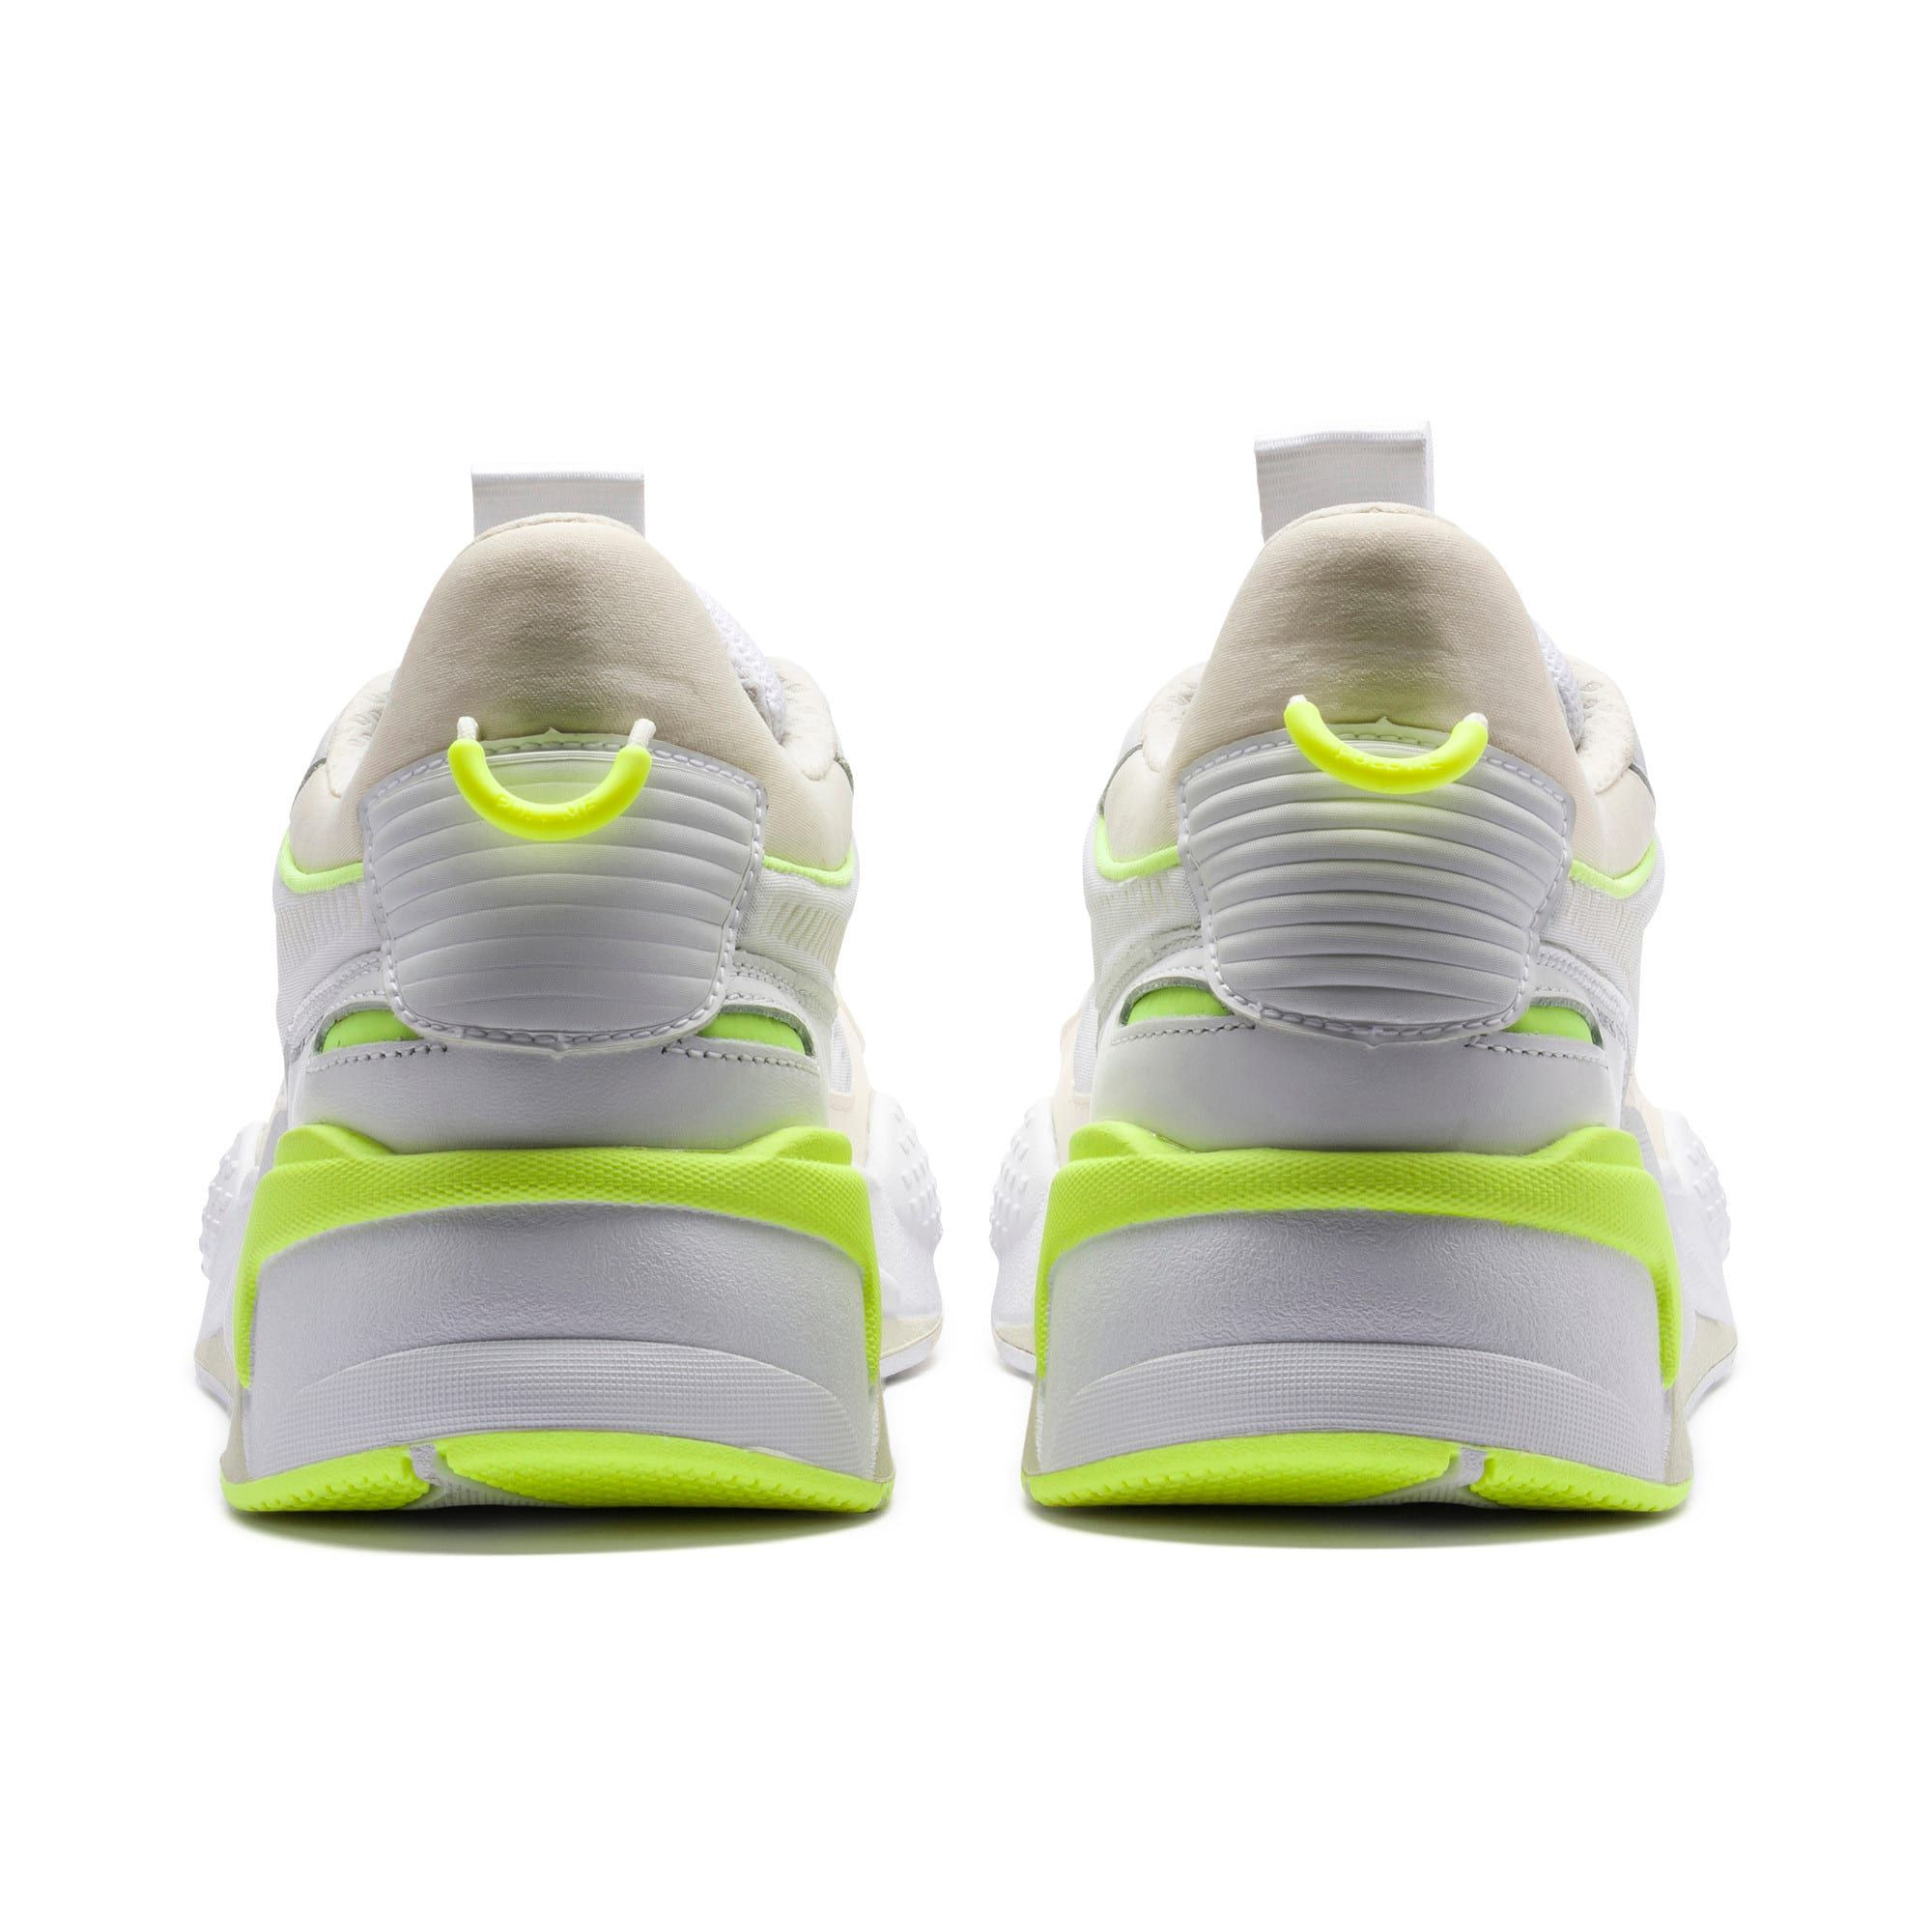 PUMA Chaussure Basket RS-X Tracks, Blanc, Taille 49.5